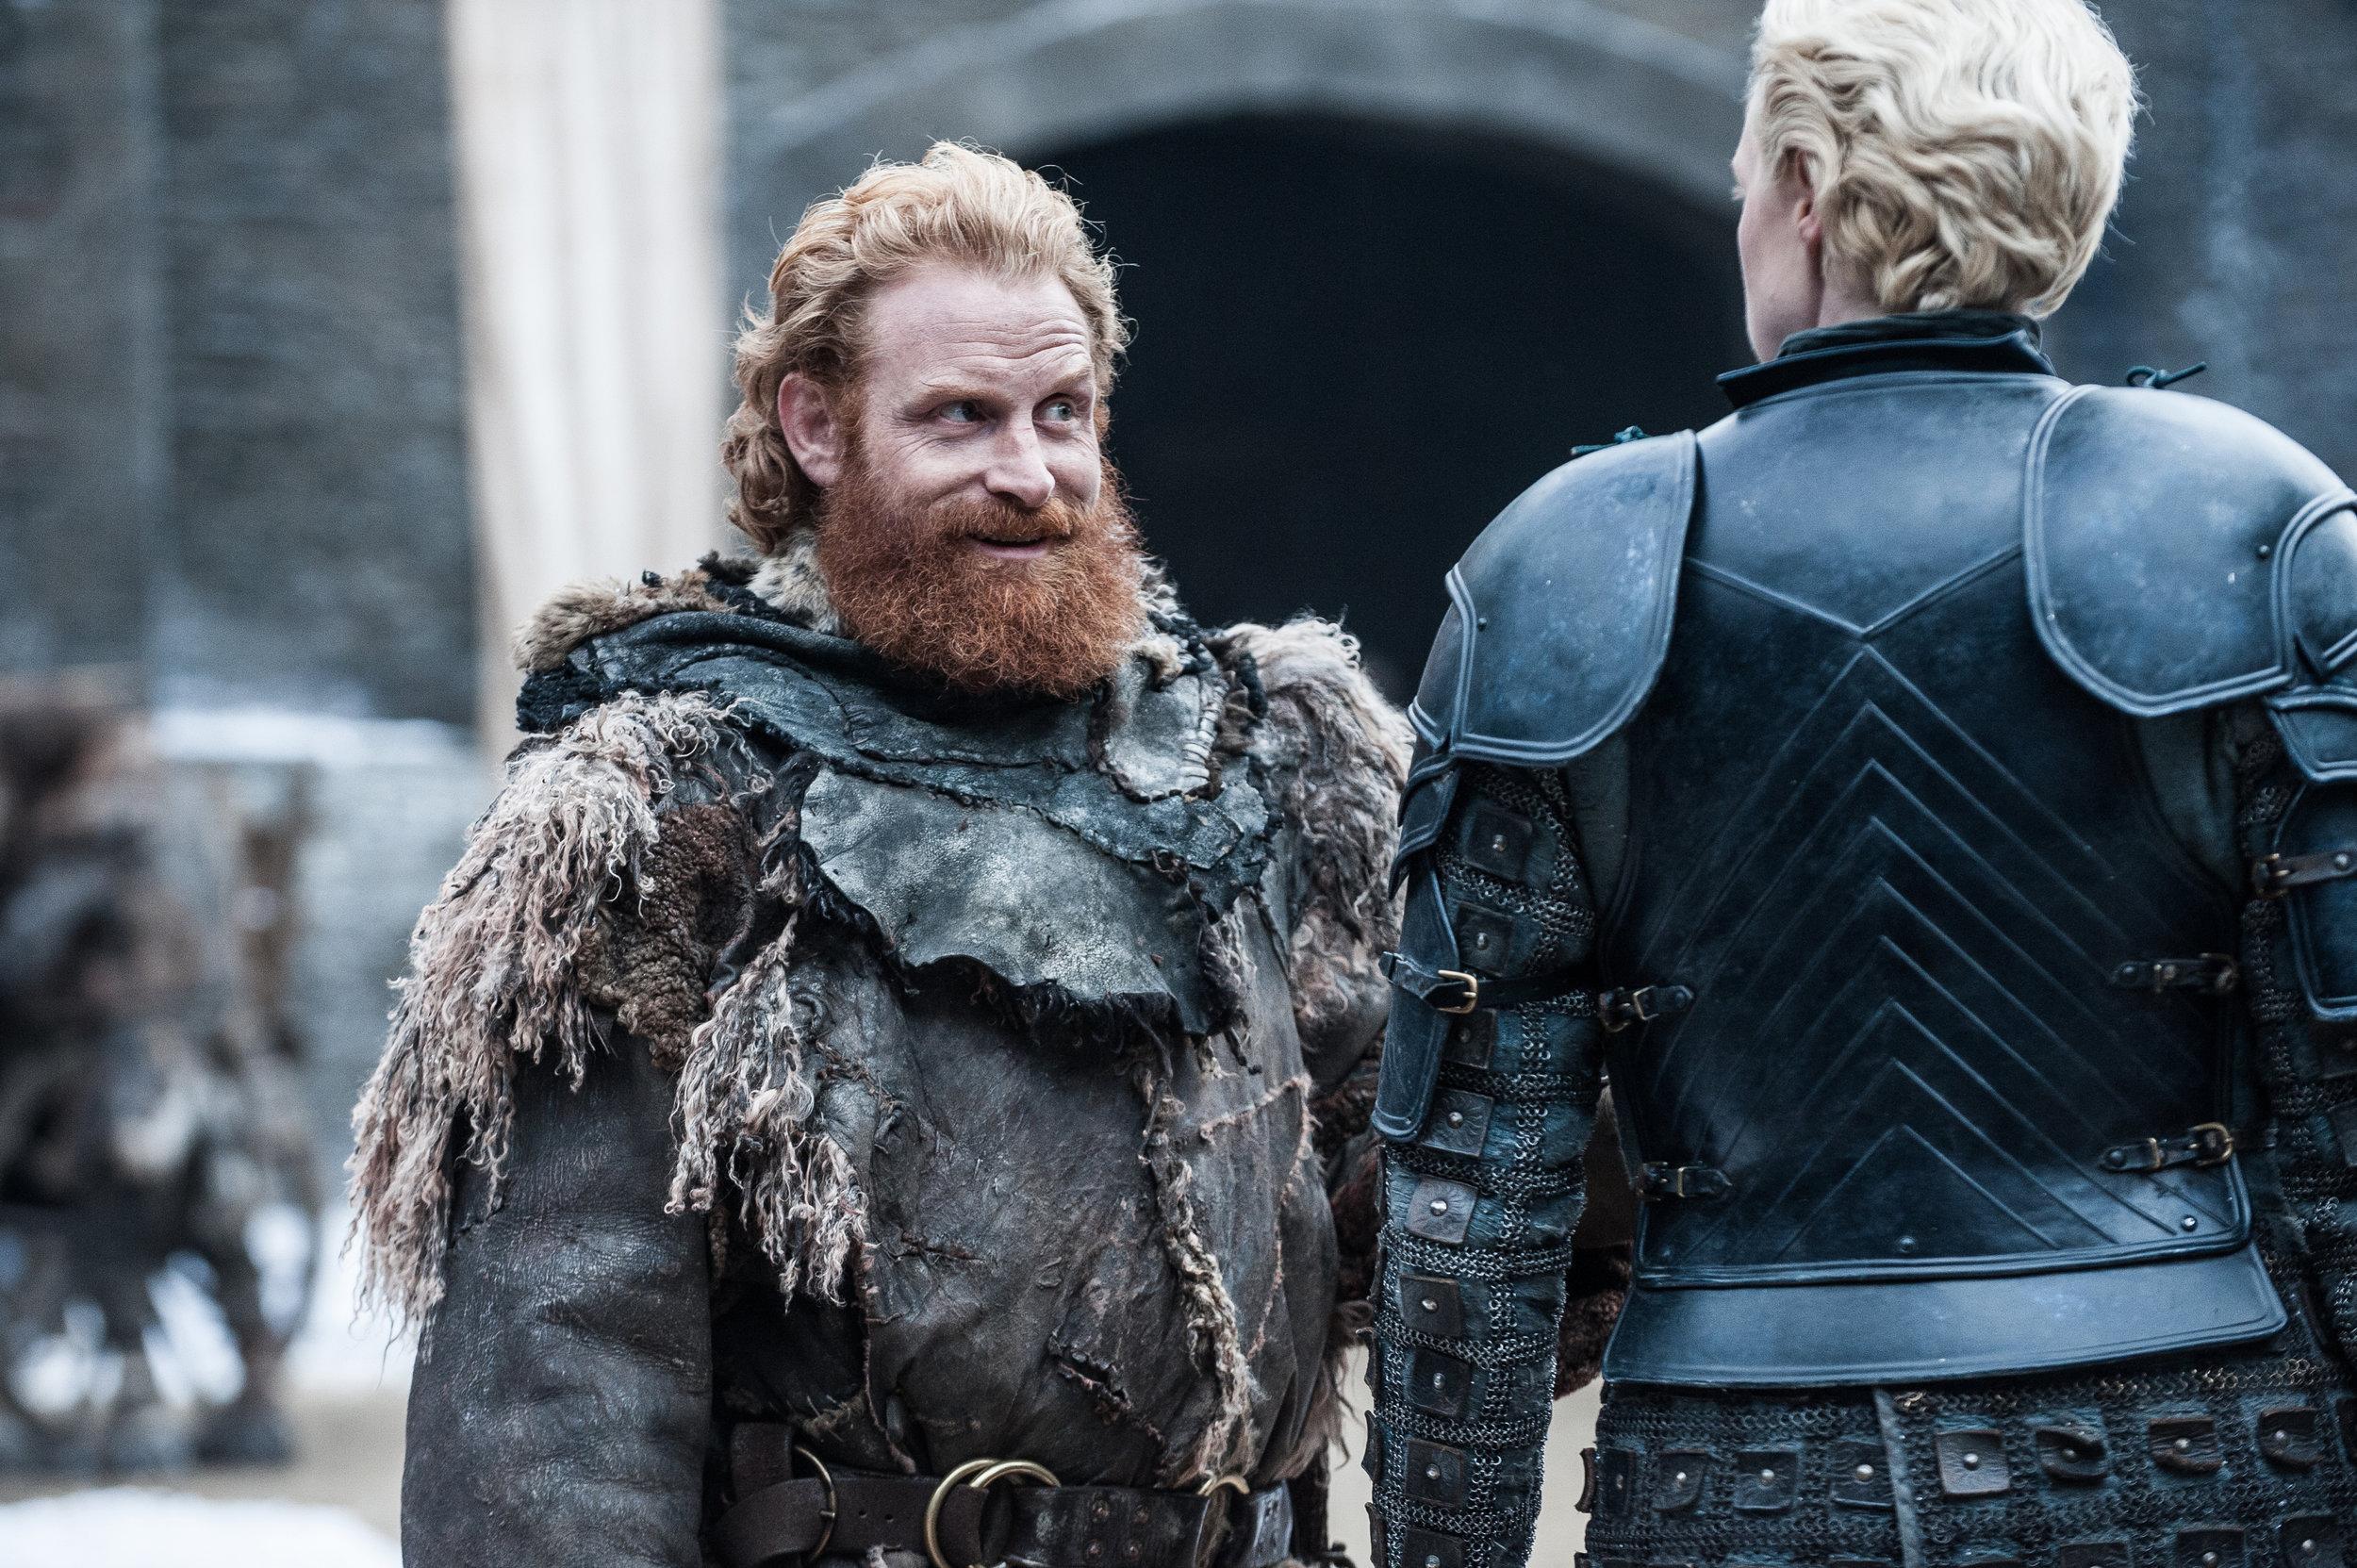 Kristofer Hivju as Tormund Giantsbane and  Gwendoline Christie as Brienne of Tarth - Photo: Helen Sloan/HBO